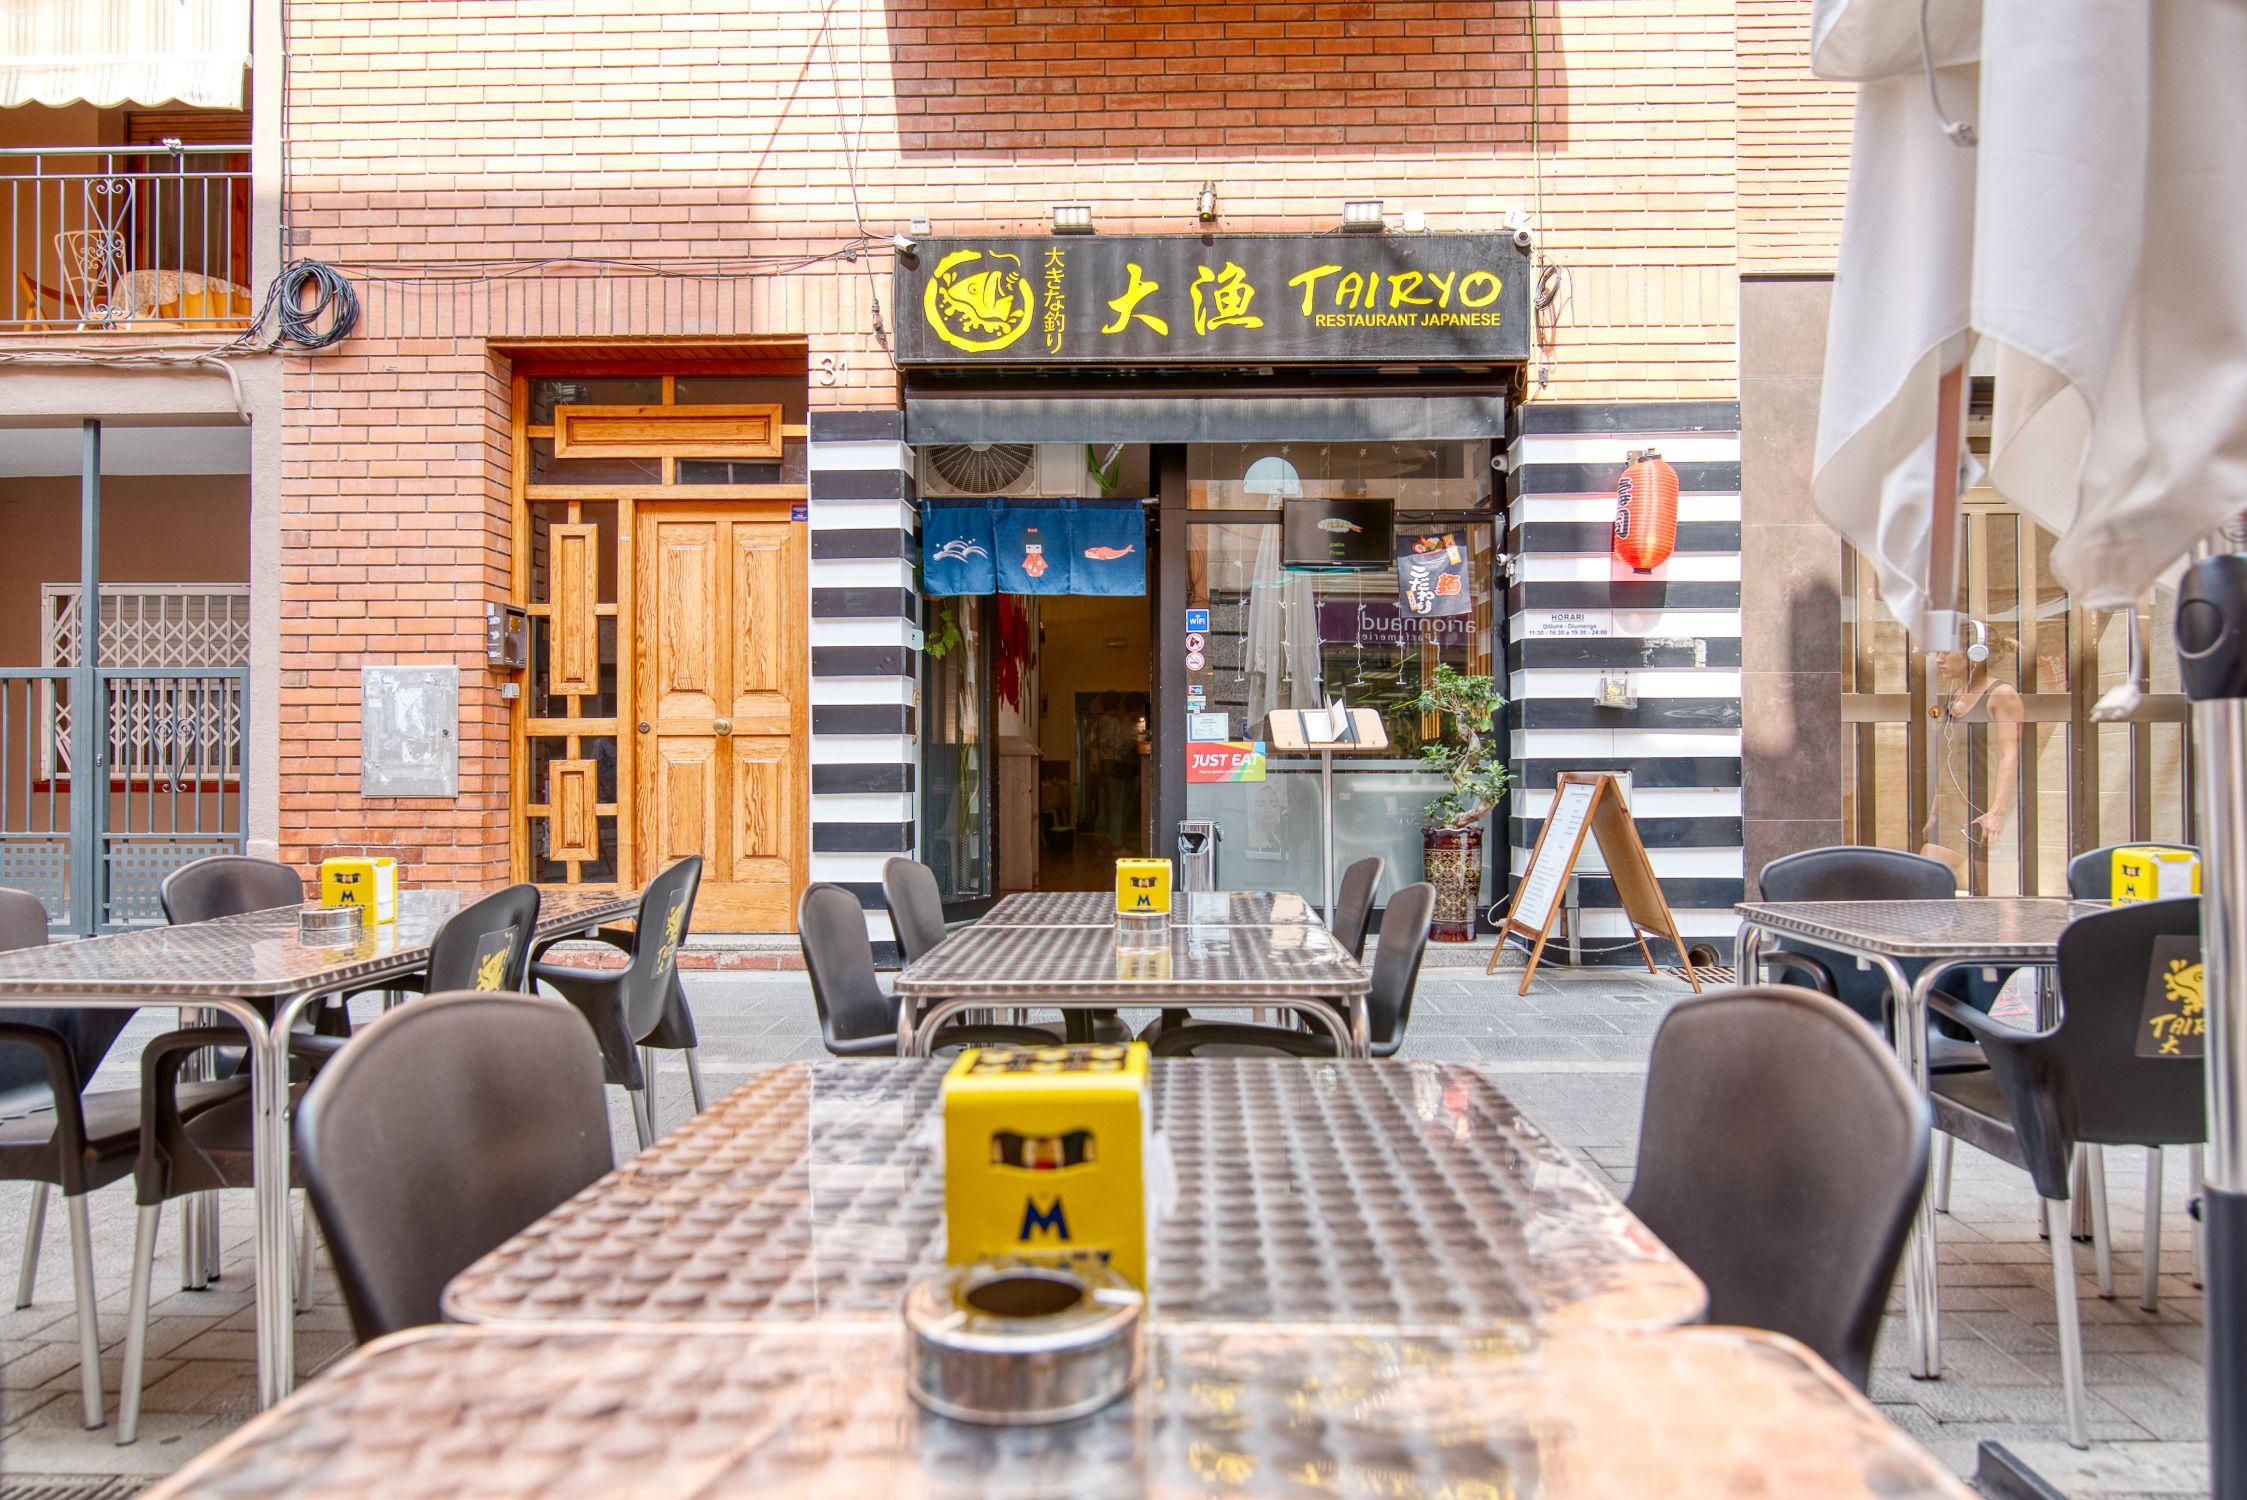 Foto 1 de Restaurante japonés en  | Tairyo Restaurant Japanese